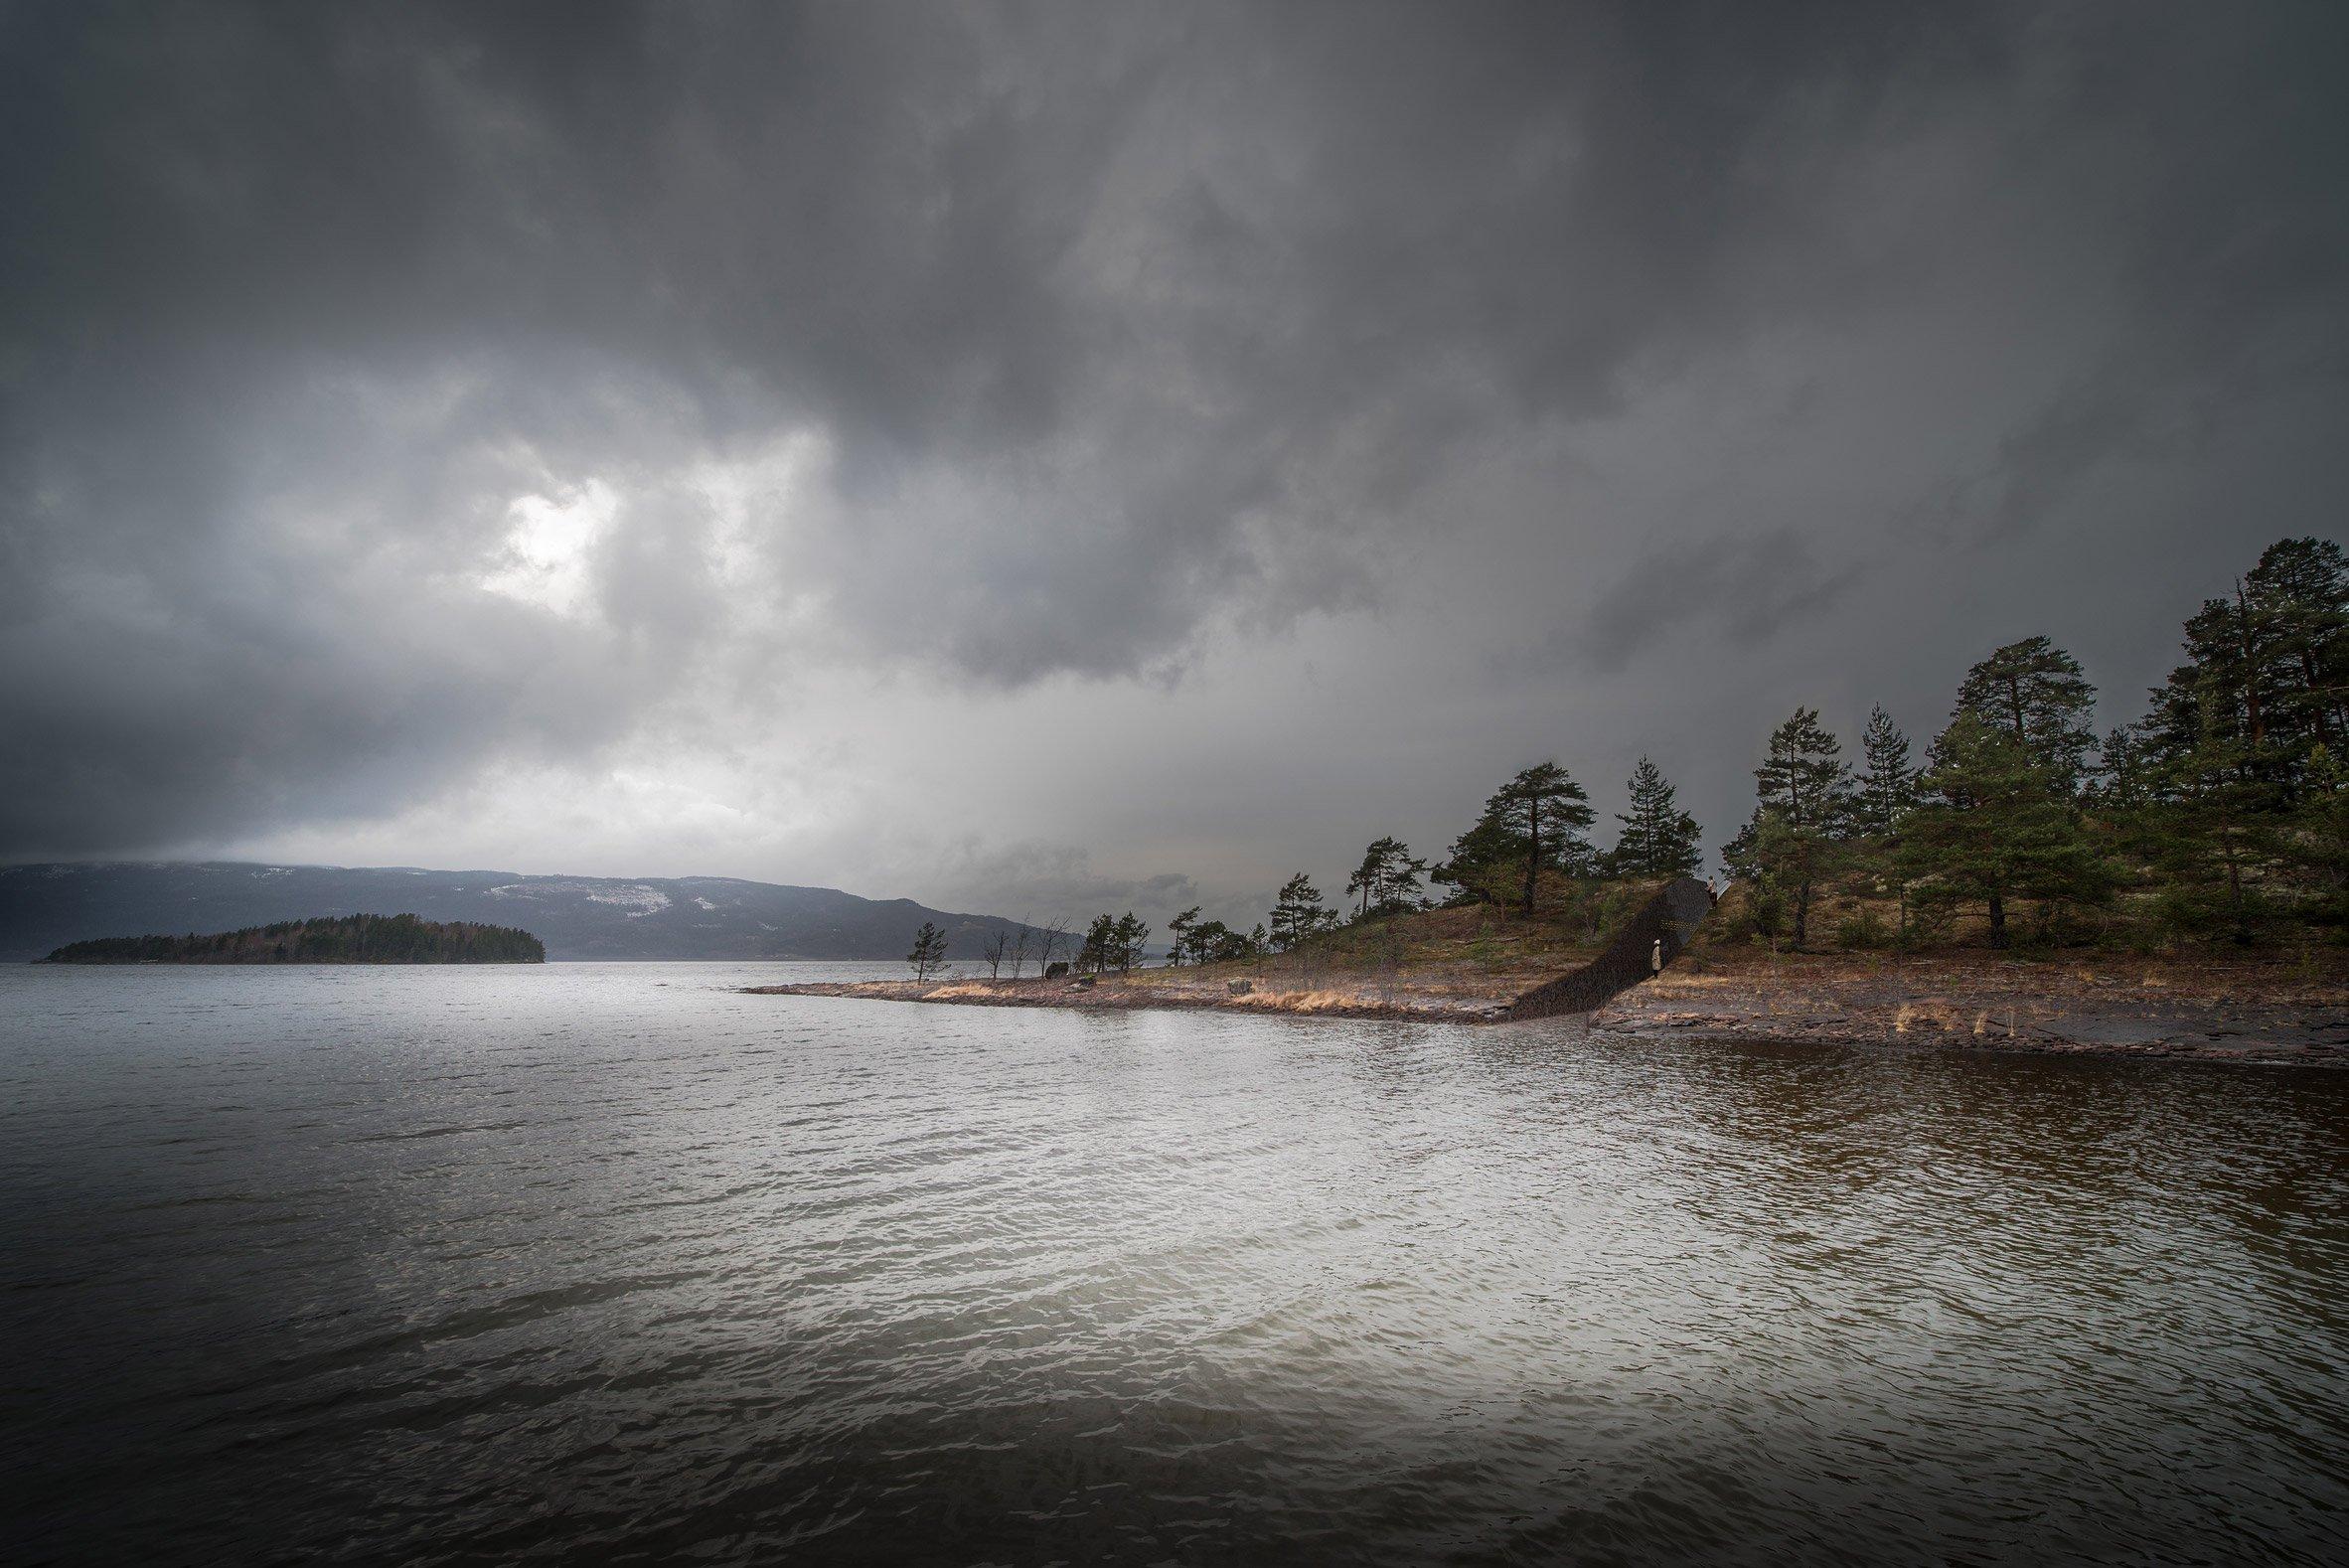 Norway scraps plans for controversial memorial near site of 2011 Utøya terrorist attack